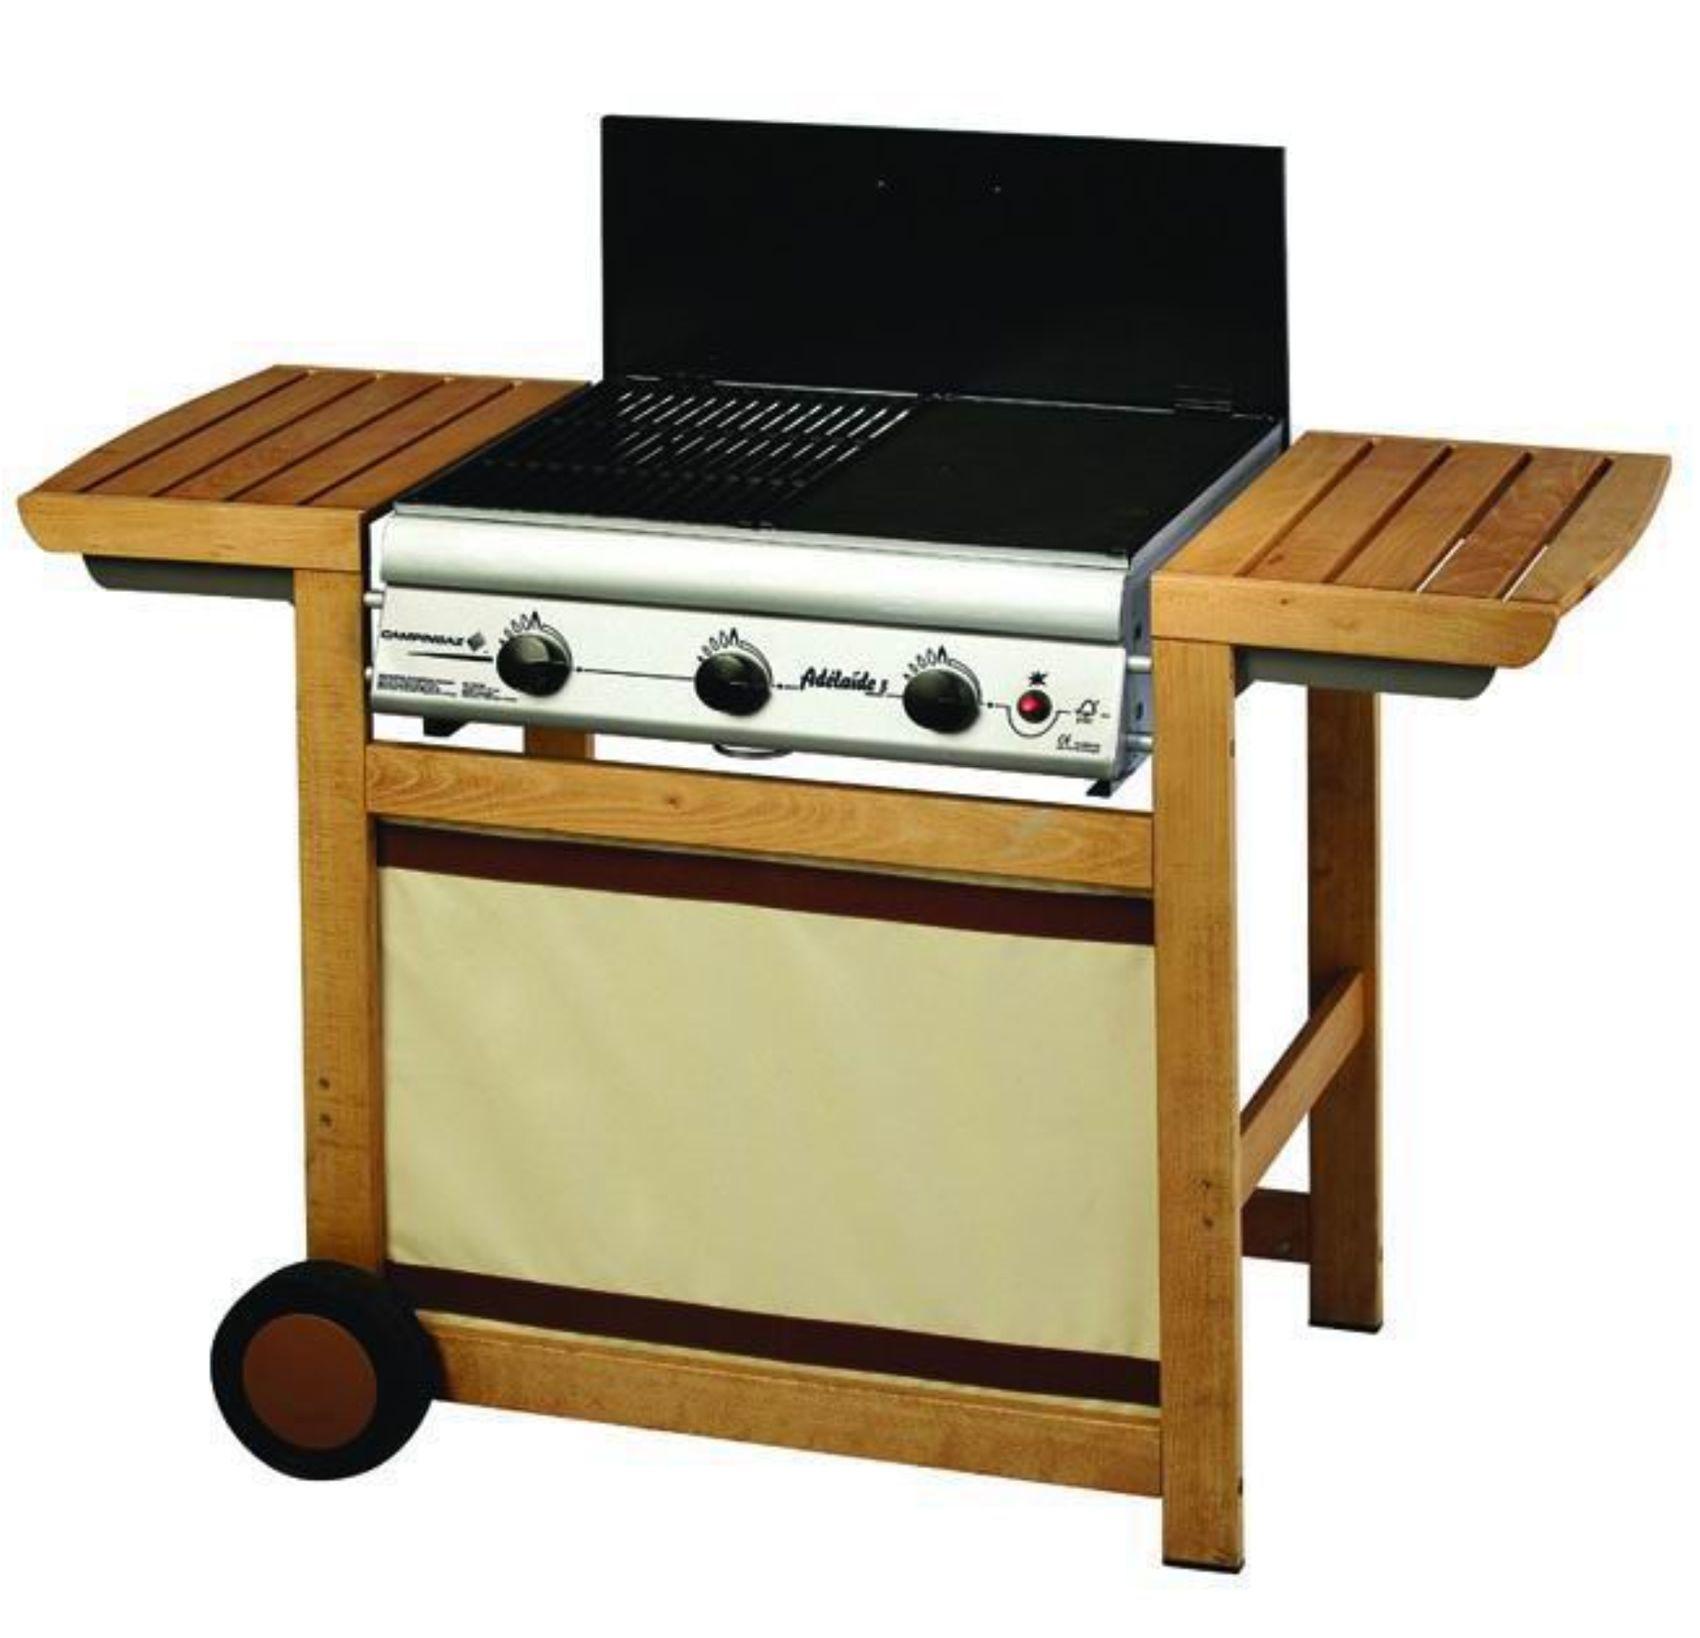 Recensione campingaz adelaide 3 woody for Copertura per barbecue a gas